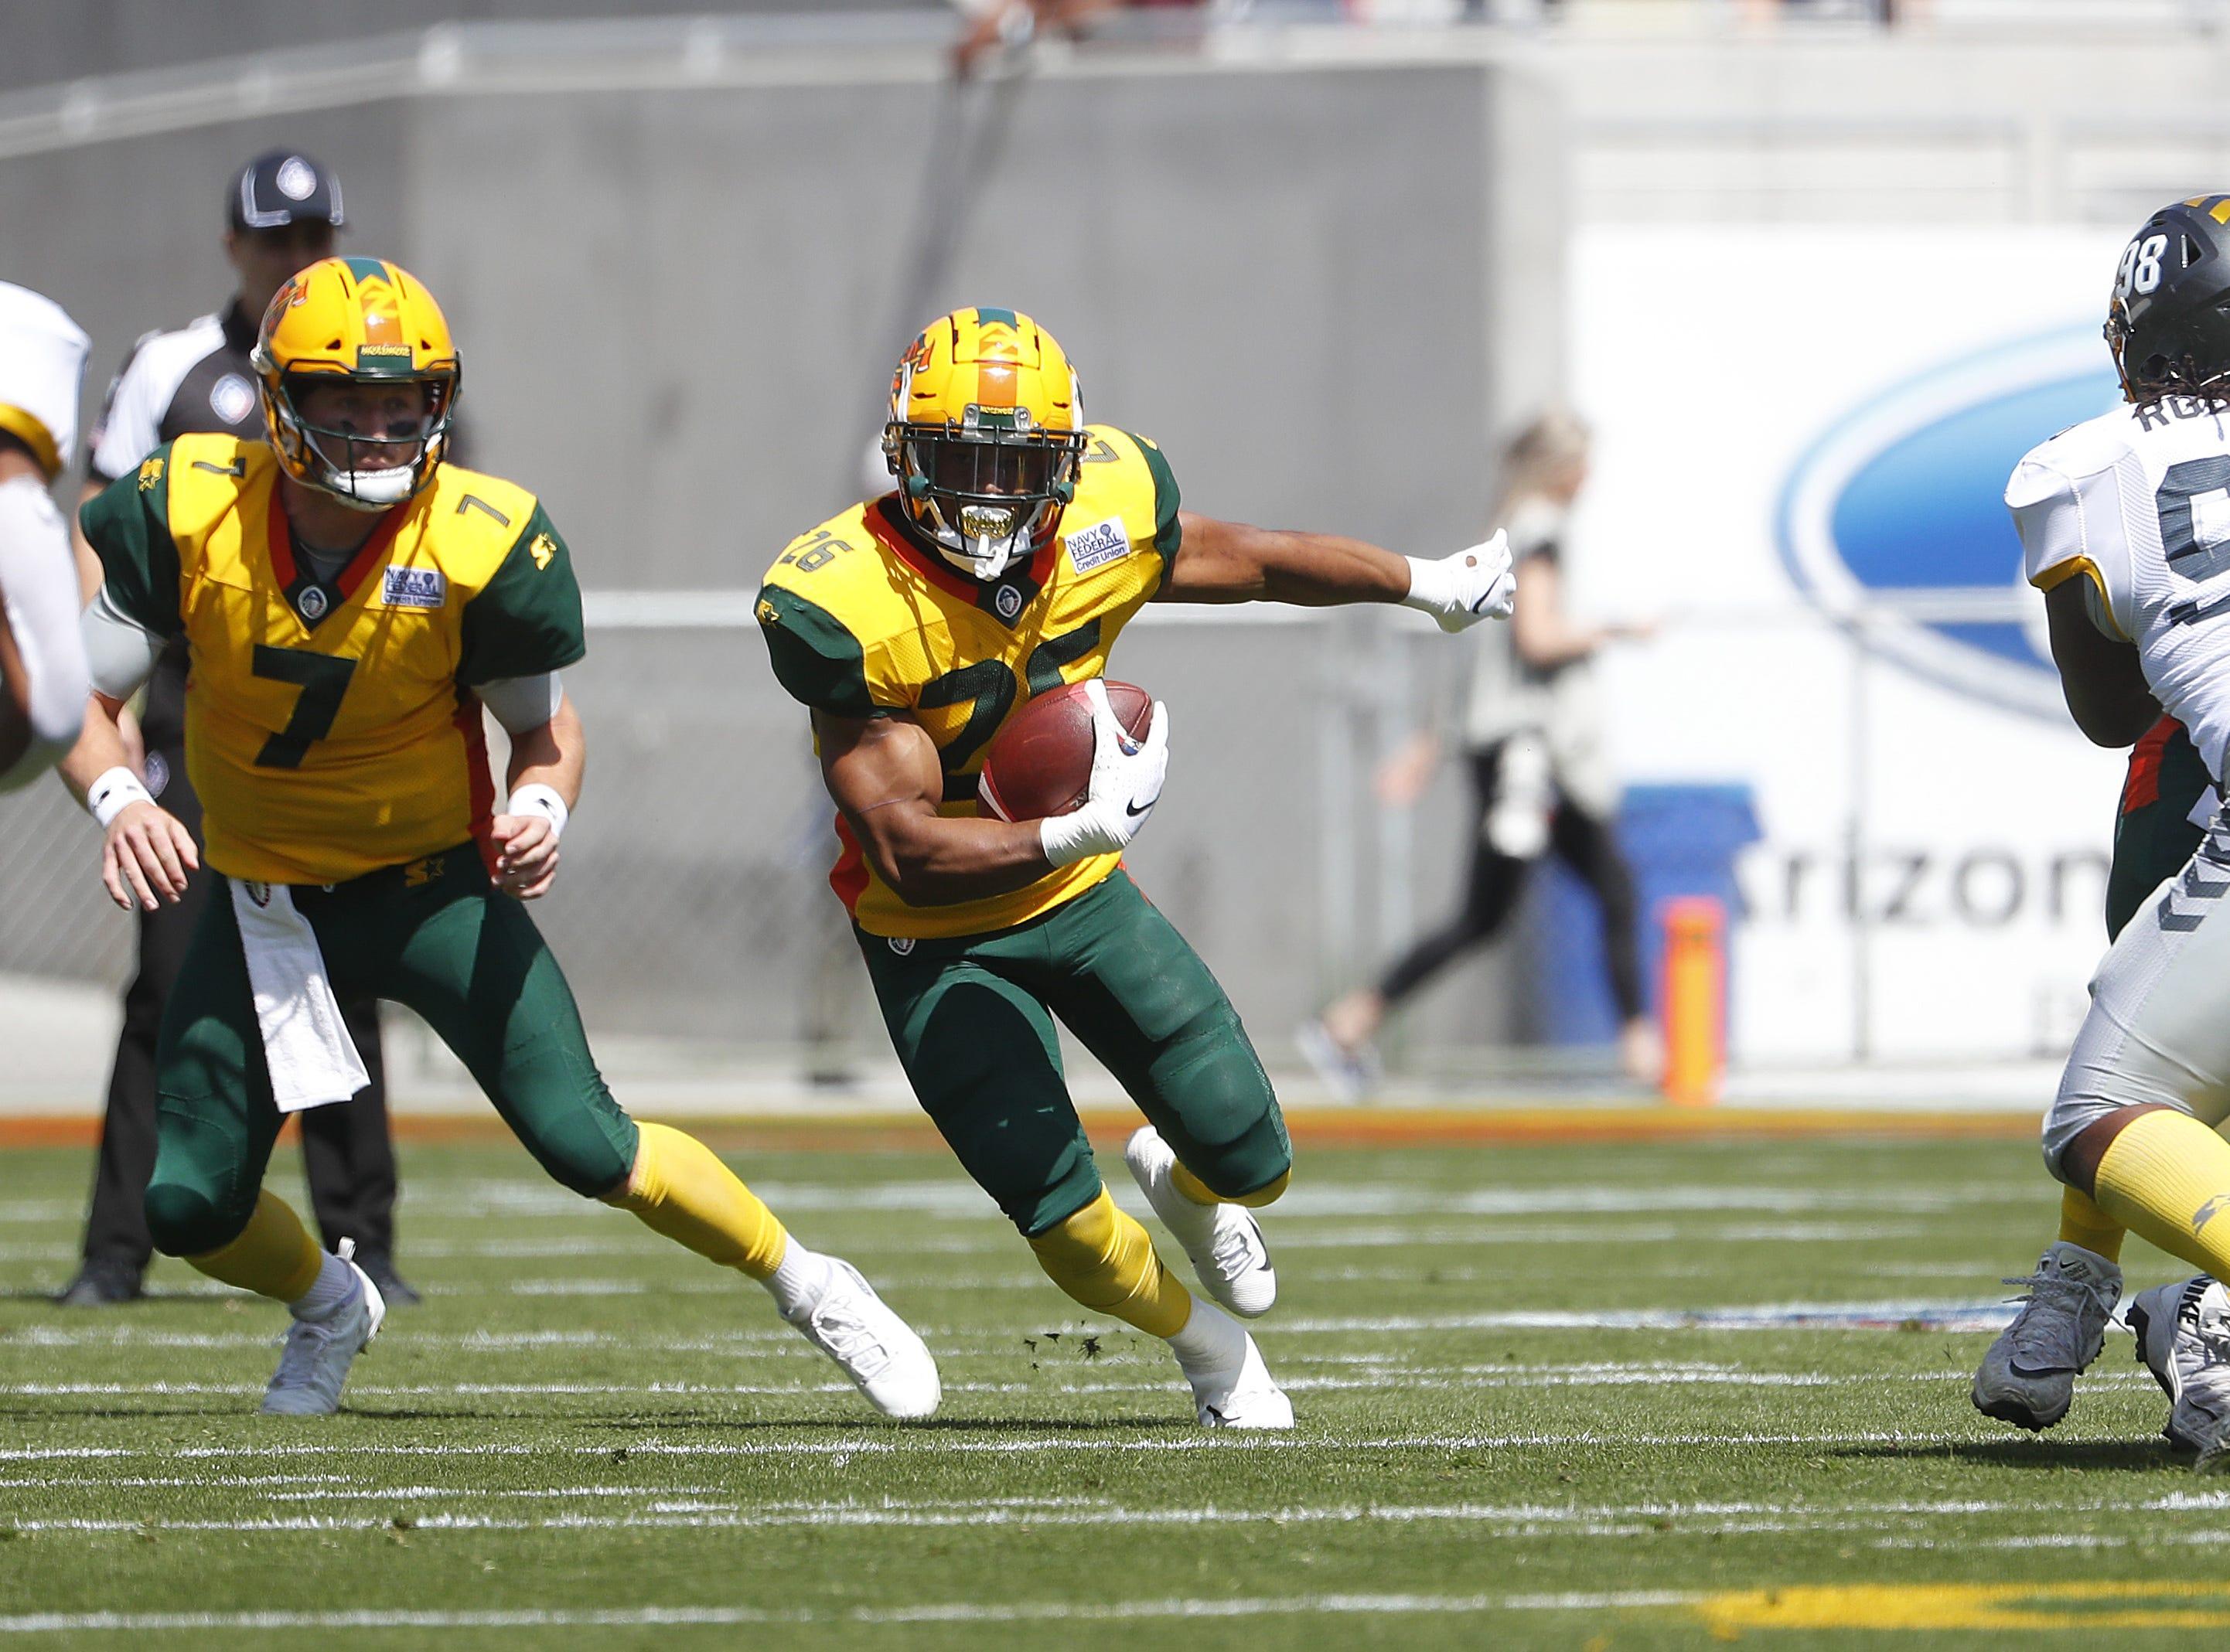 Hotshot's Jhurell Pressley (26) runs down the field against the Fleet during the first half at Sun Devil Stadium in Tempe, Ariz. on March 24, 2019.